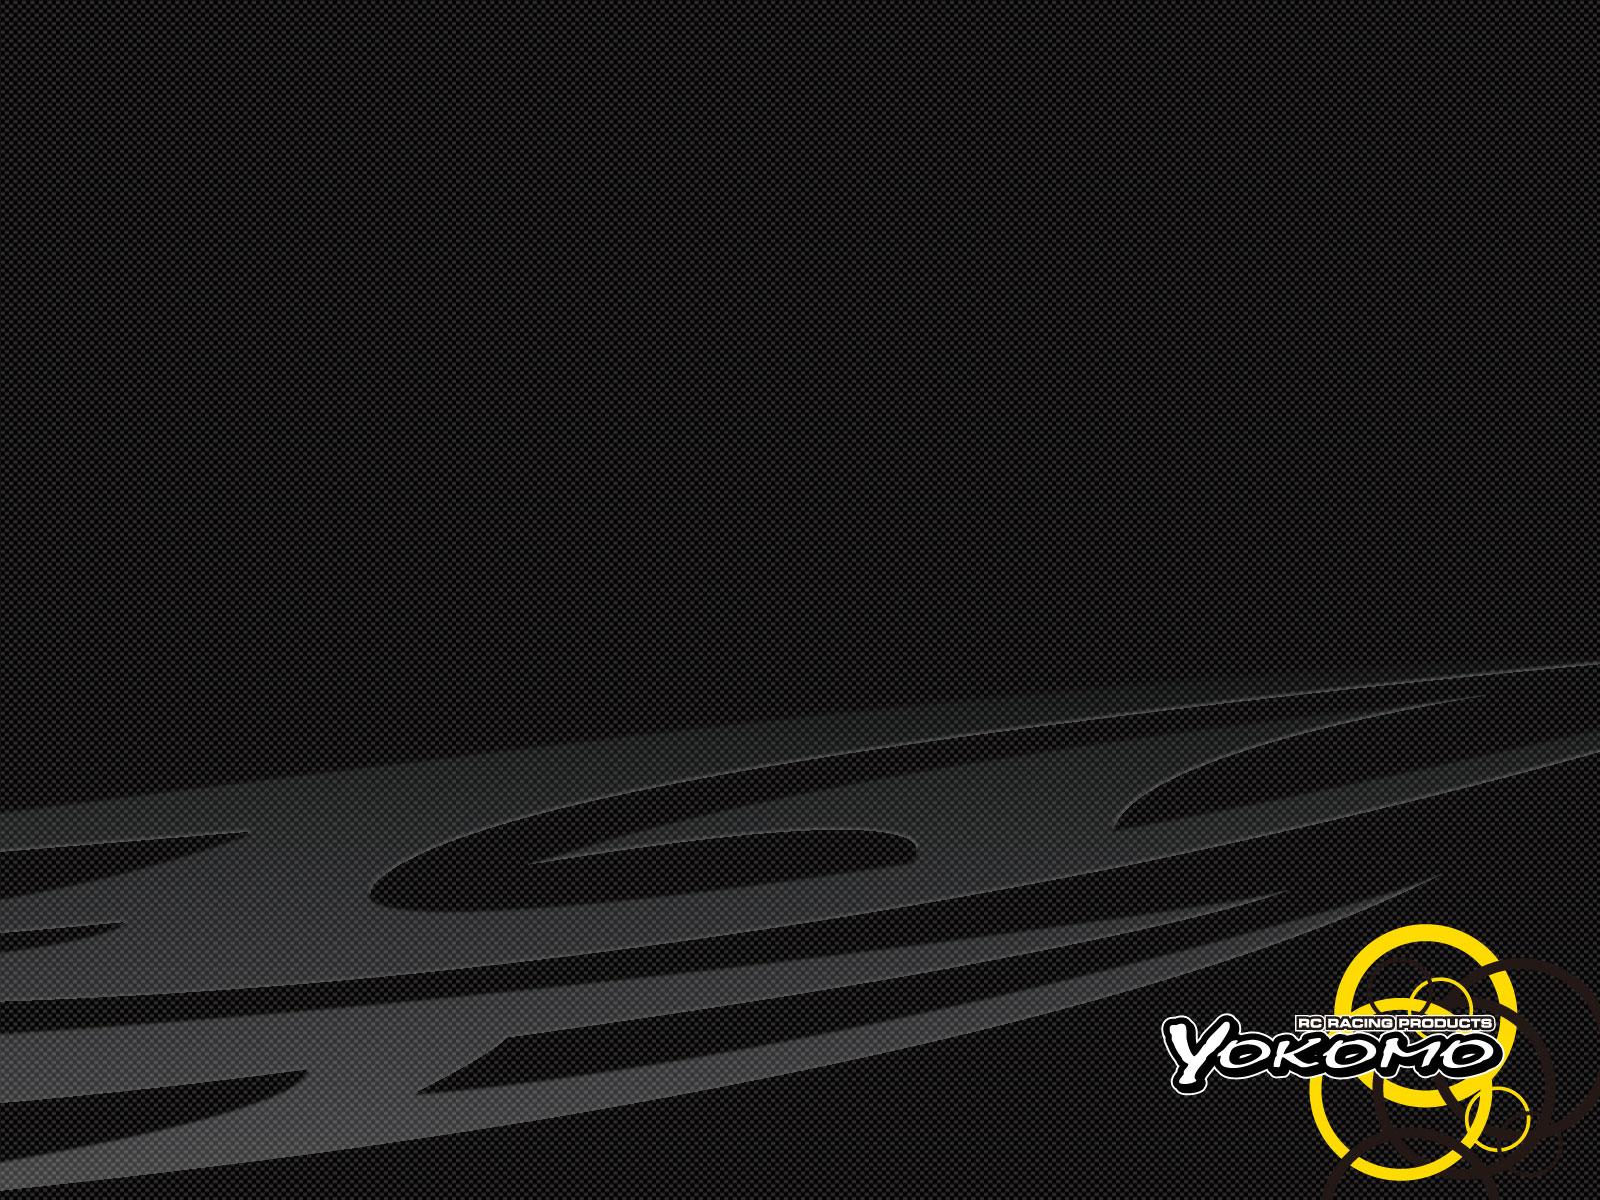 Download Rcカーのヨコモ Yokomo Rc Car Official Site